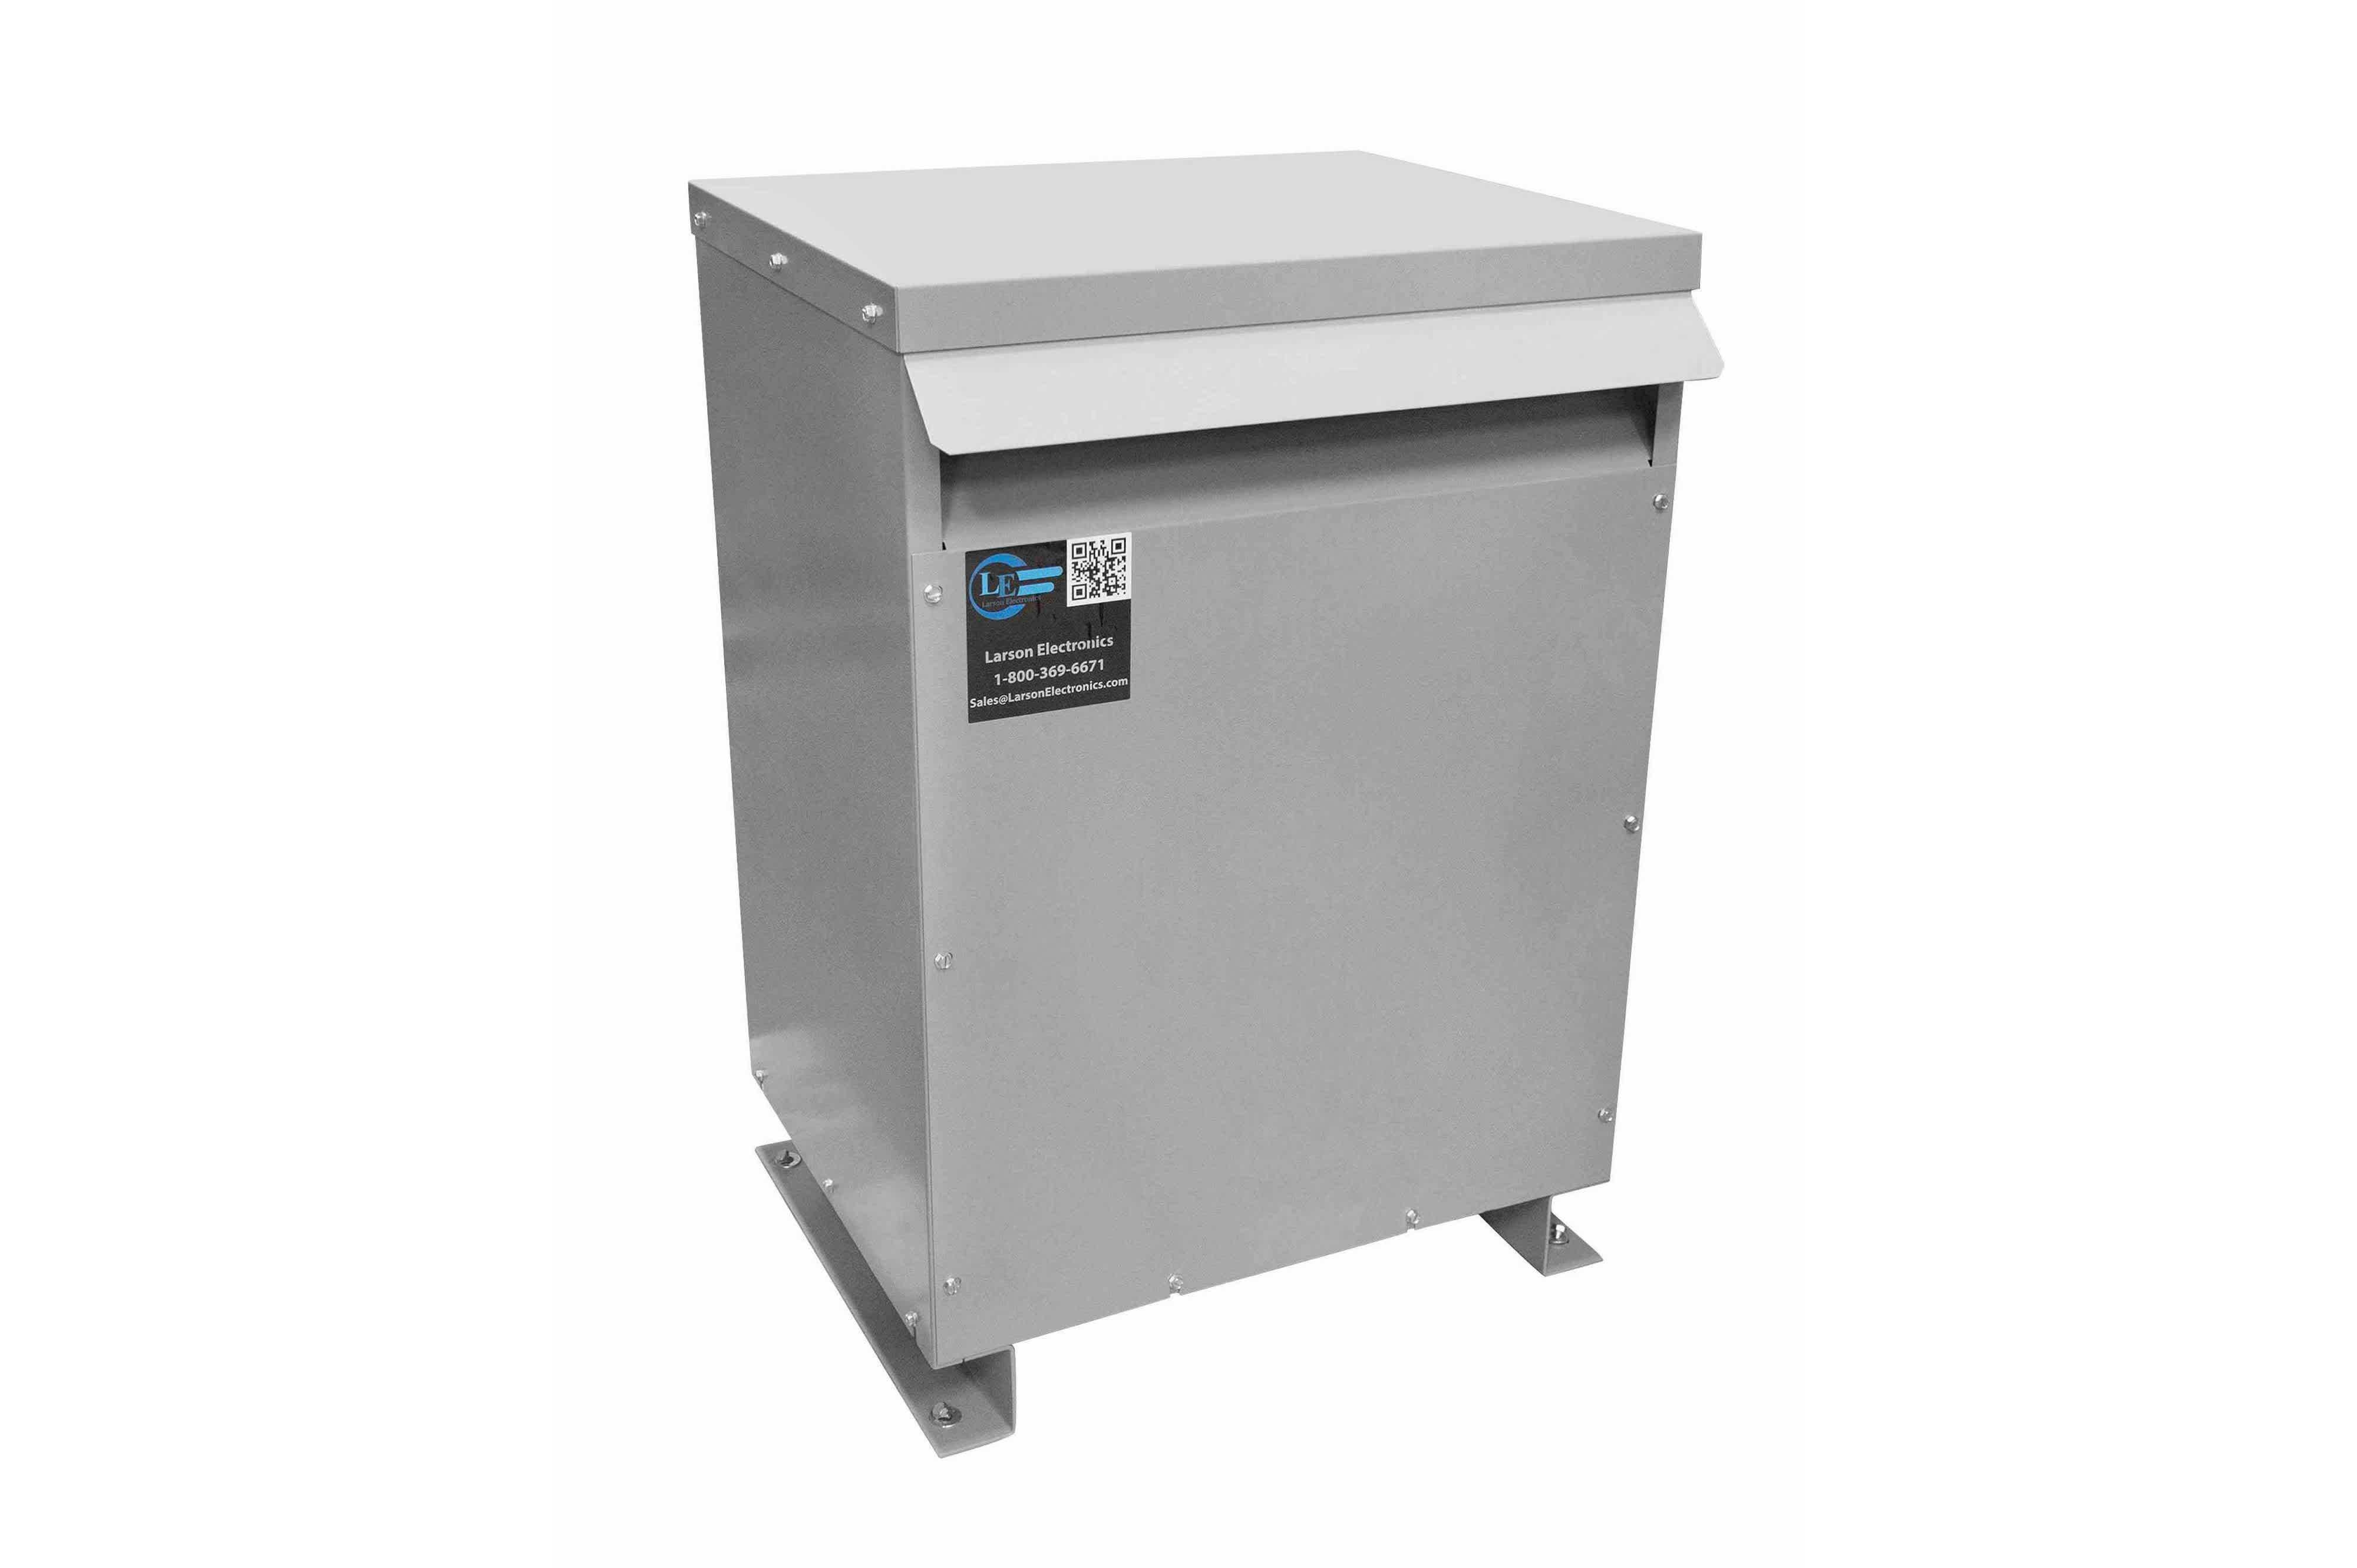 40 kVA 3PH Isolation Transformer, 460V Wye Primary, 400Y/231 Wye-N Secondary, N3R, Ventilated, 60 Hz